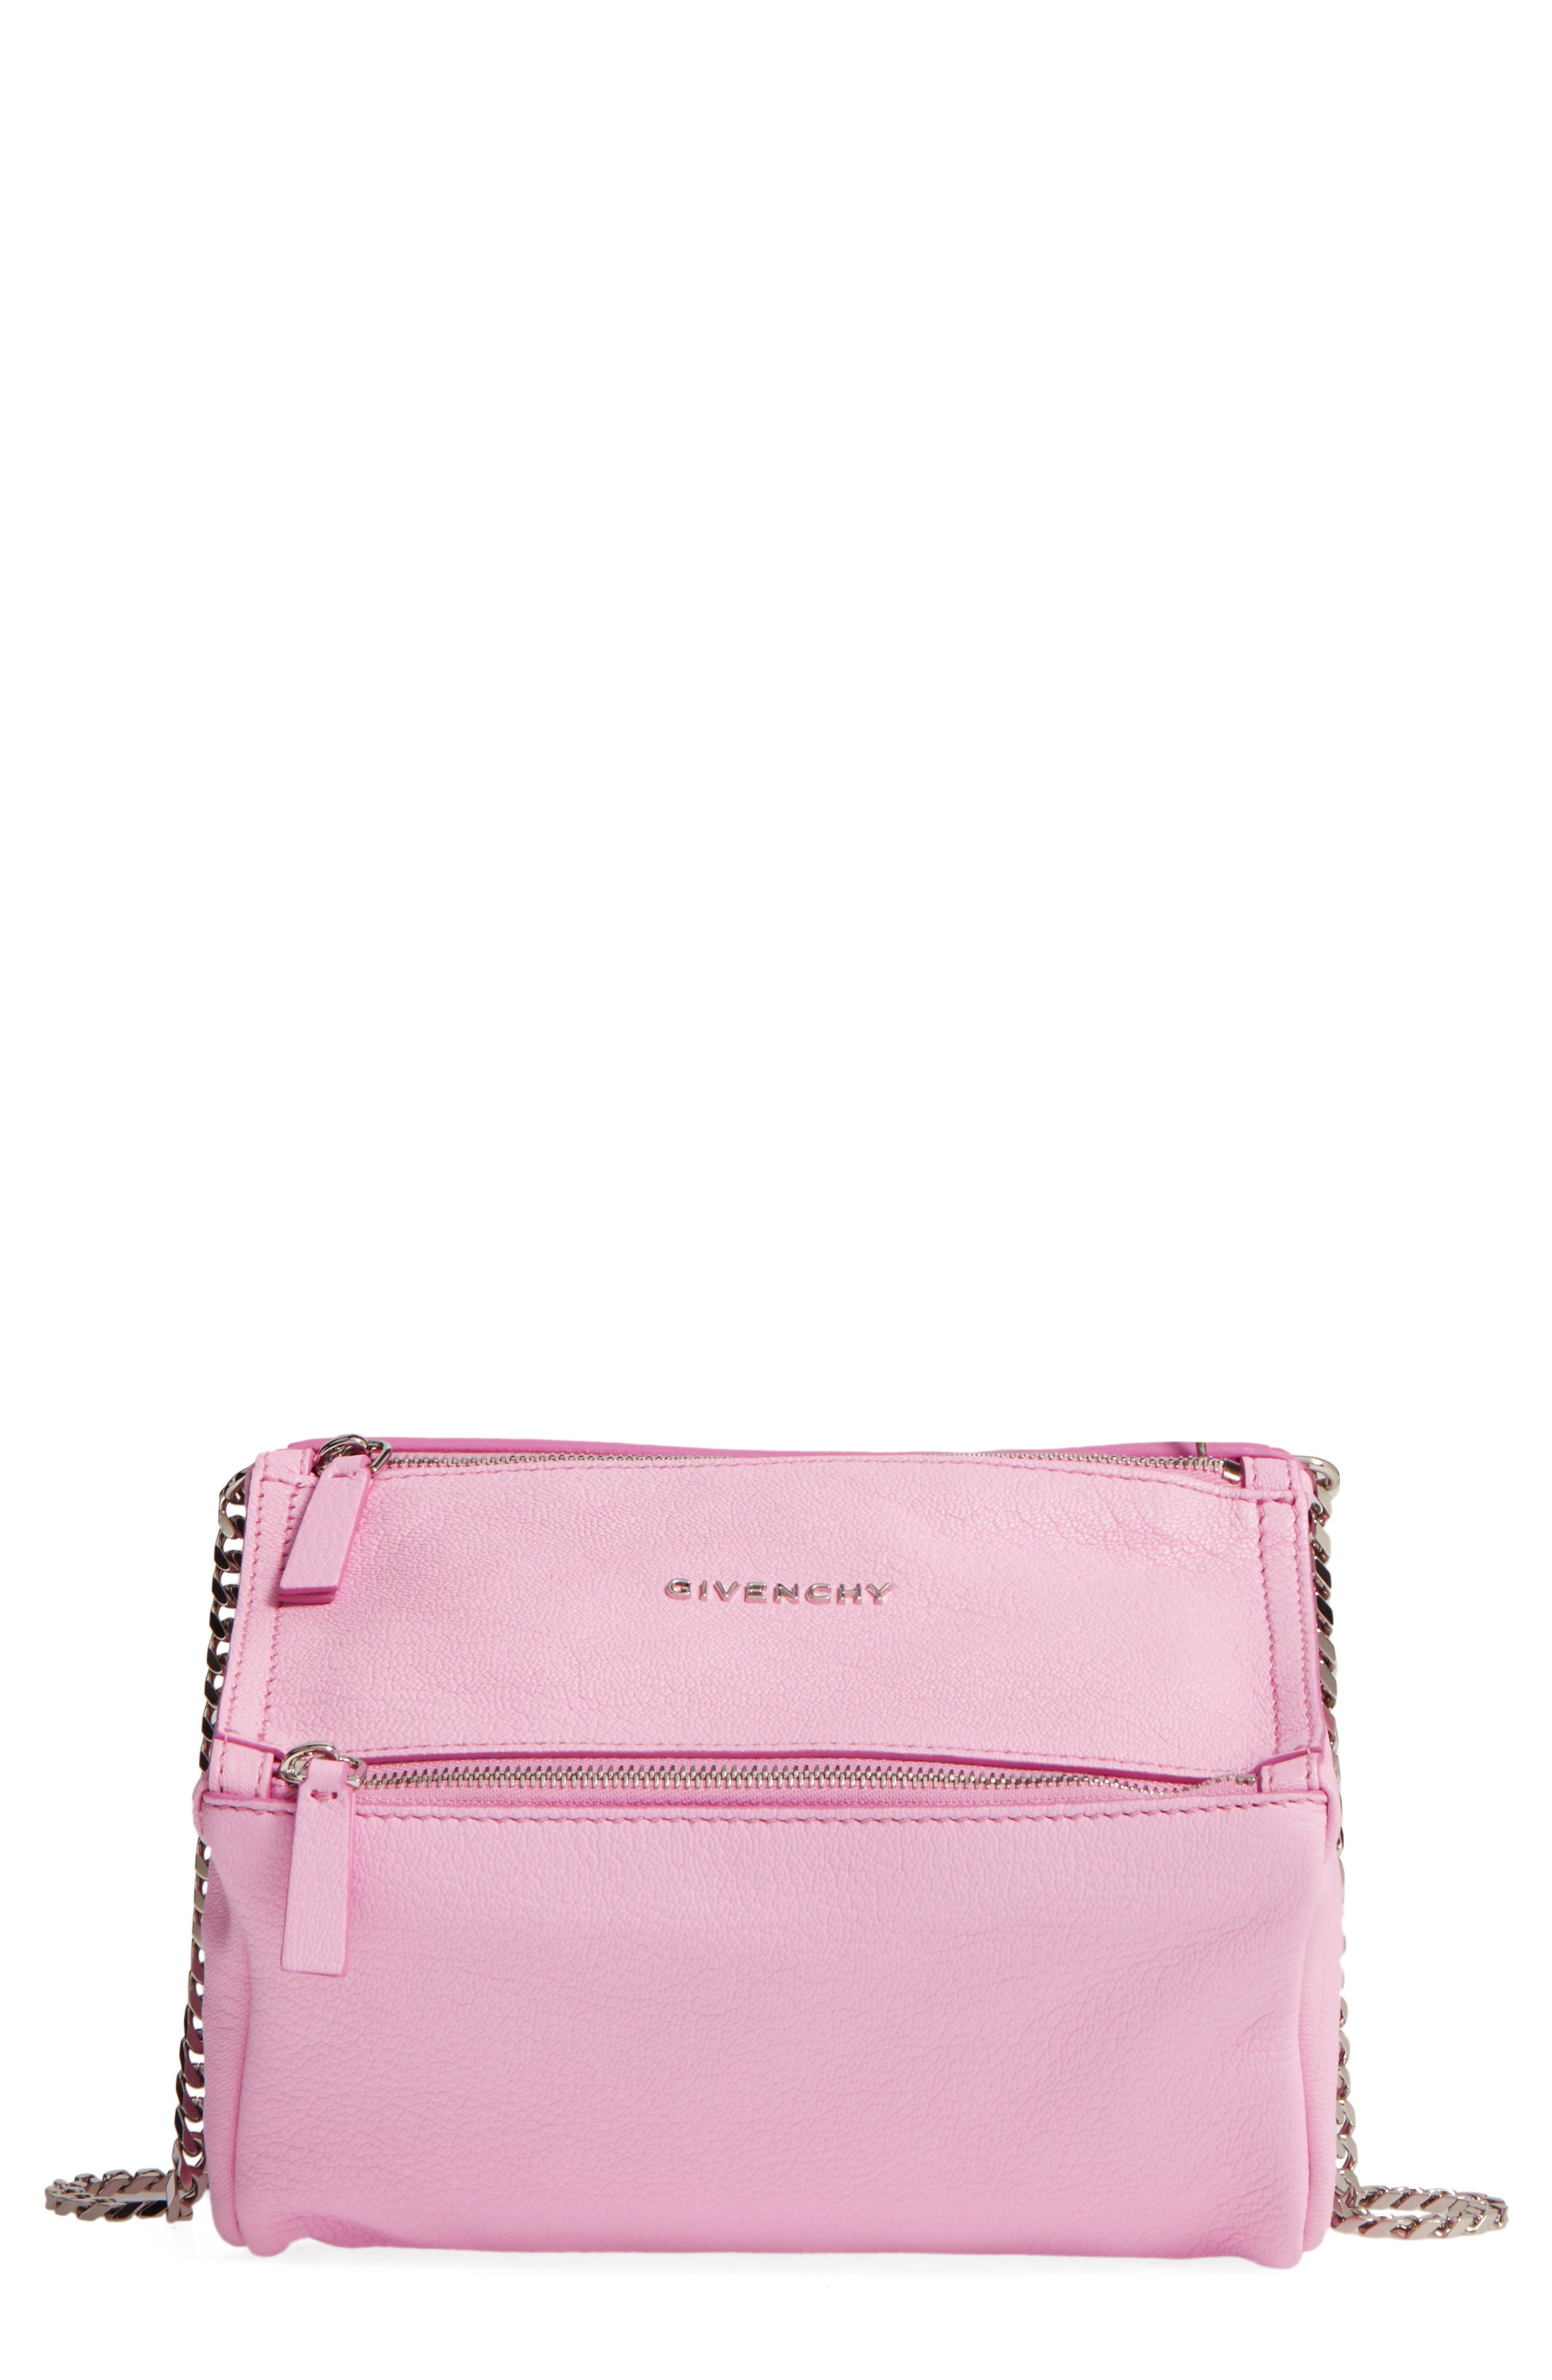 Givenchy Mini Pandora Sugar Leather Shoulder Bag